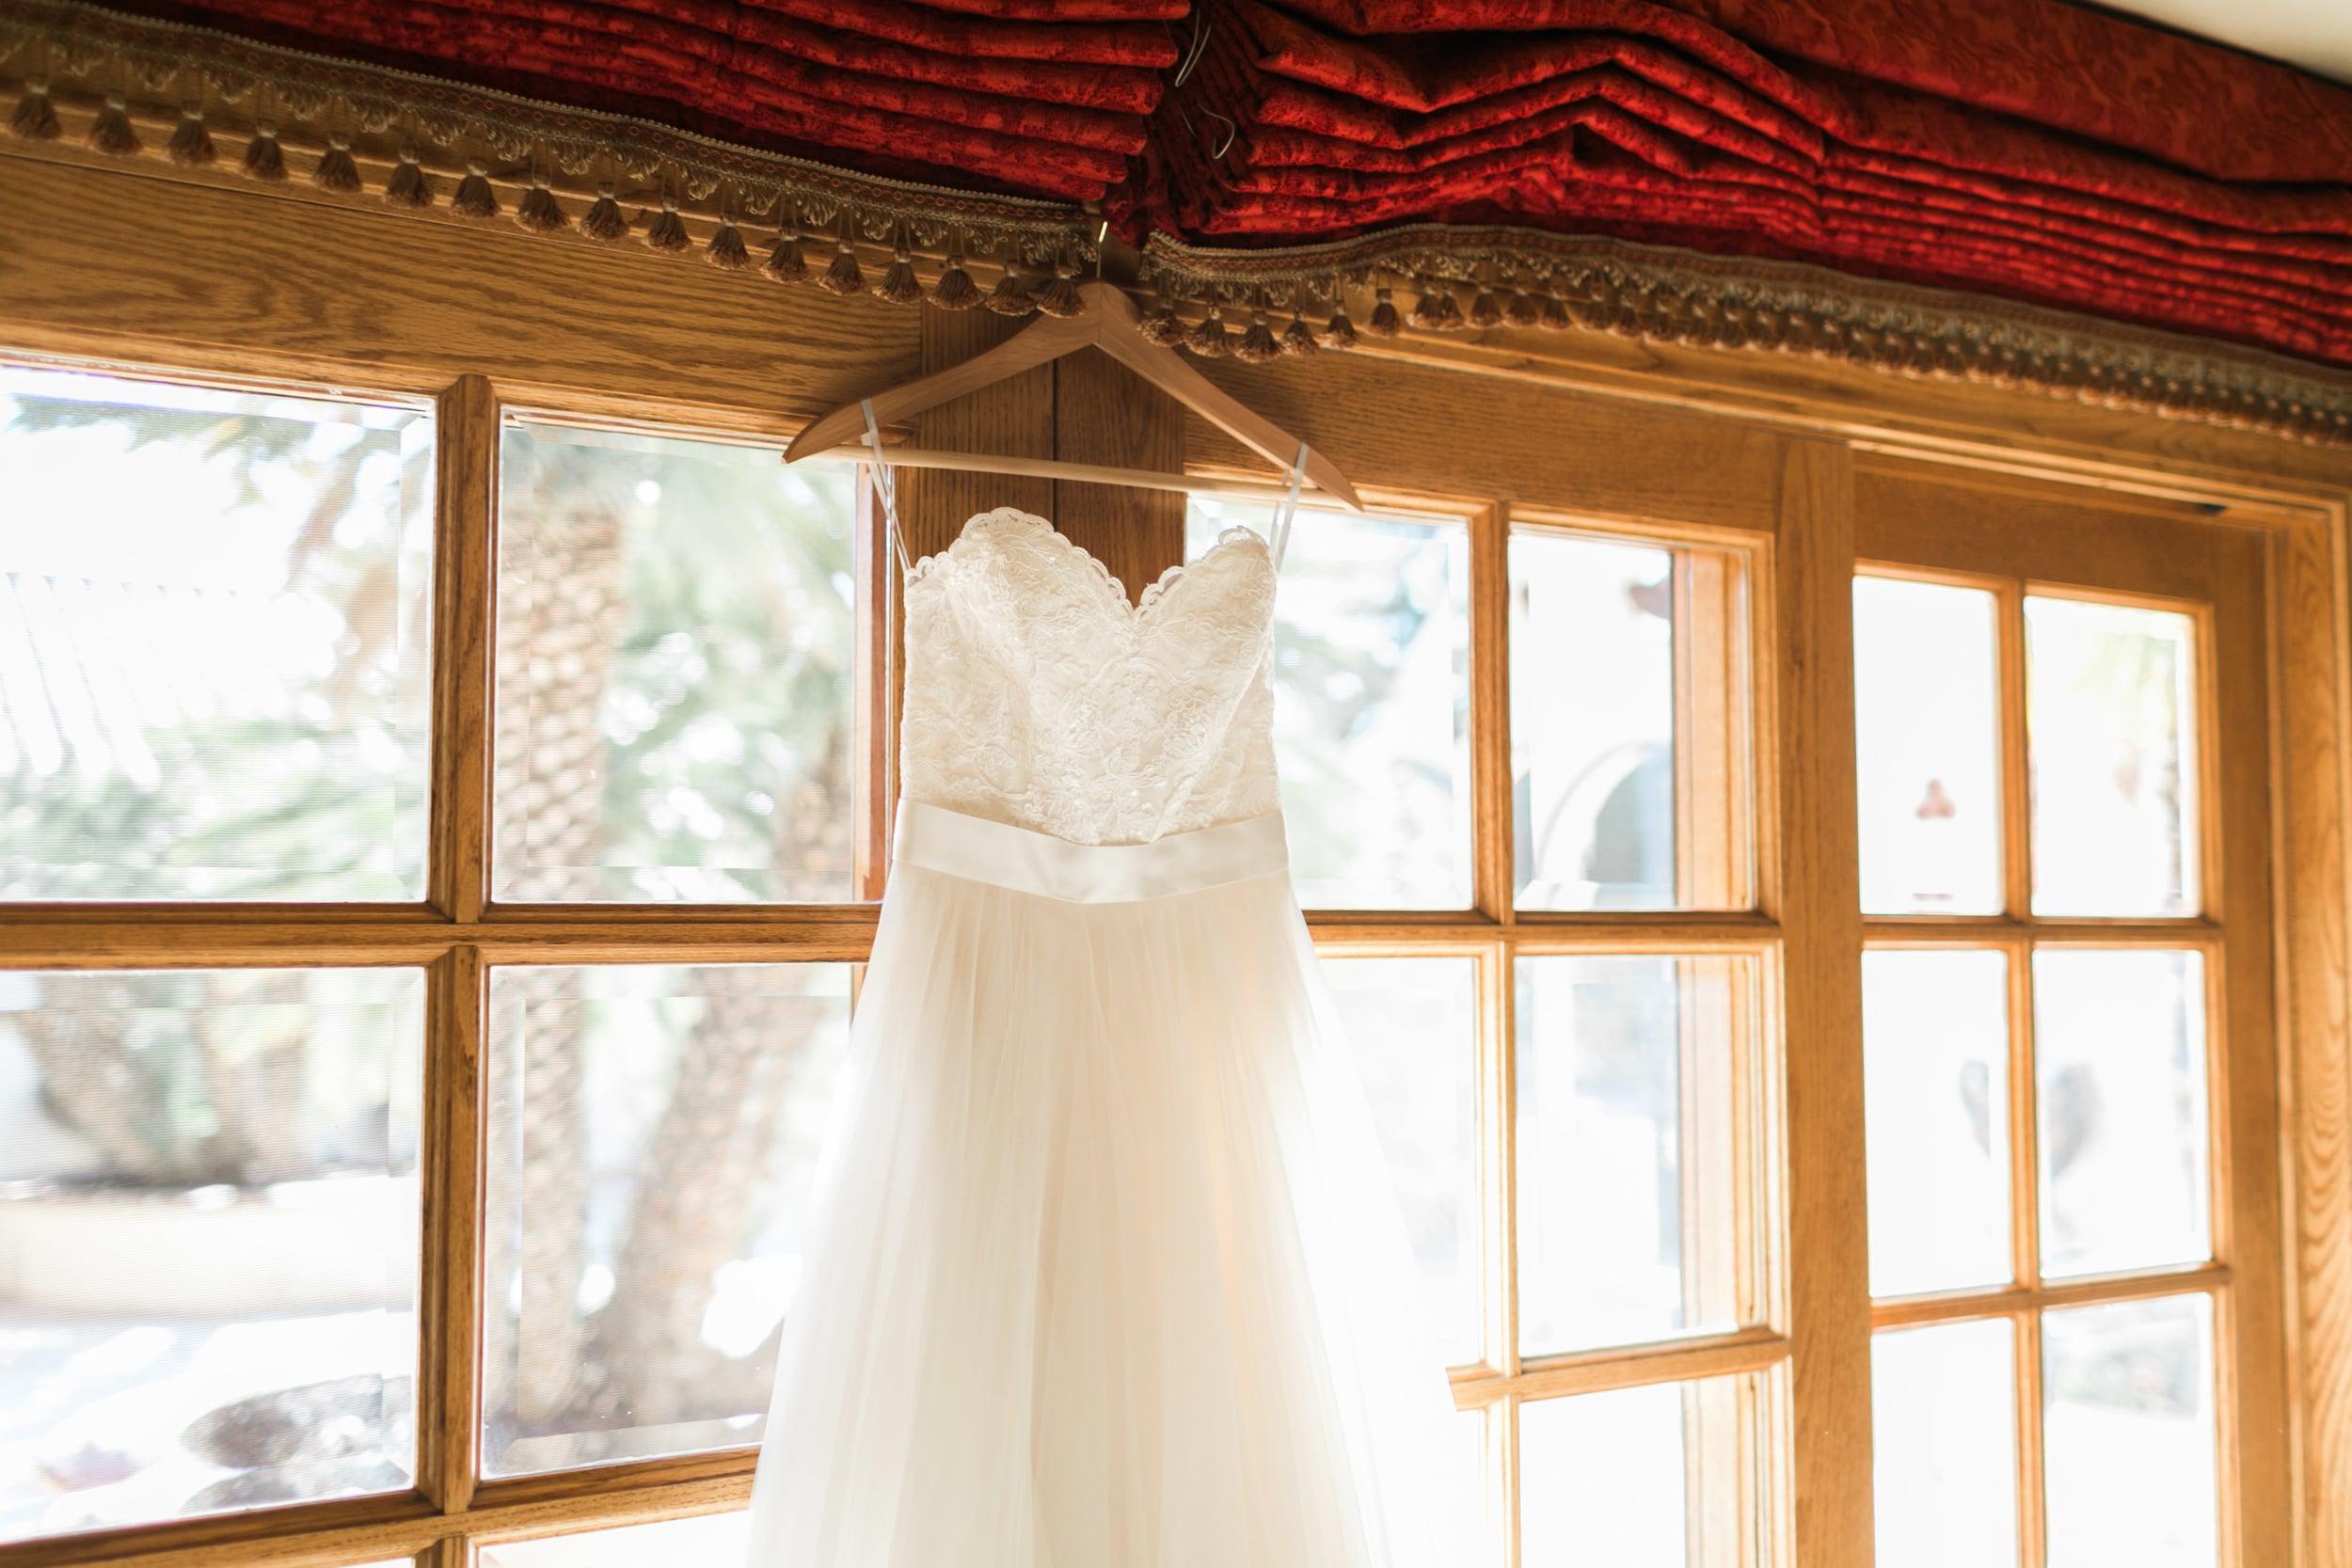 Natalie_Schutt_Photography_Winter_Wedding_San_Luis_Obispo-25.jpg